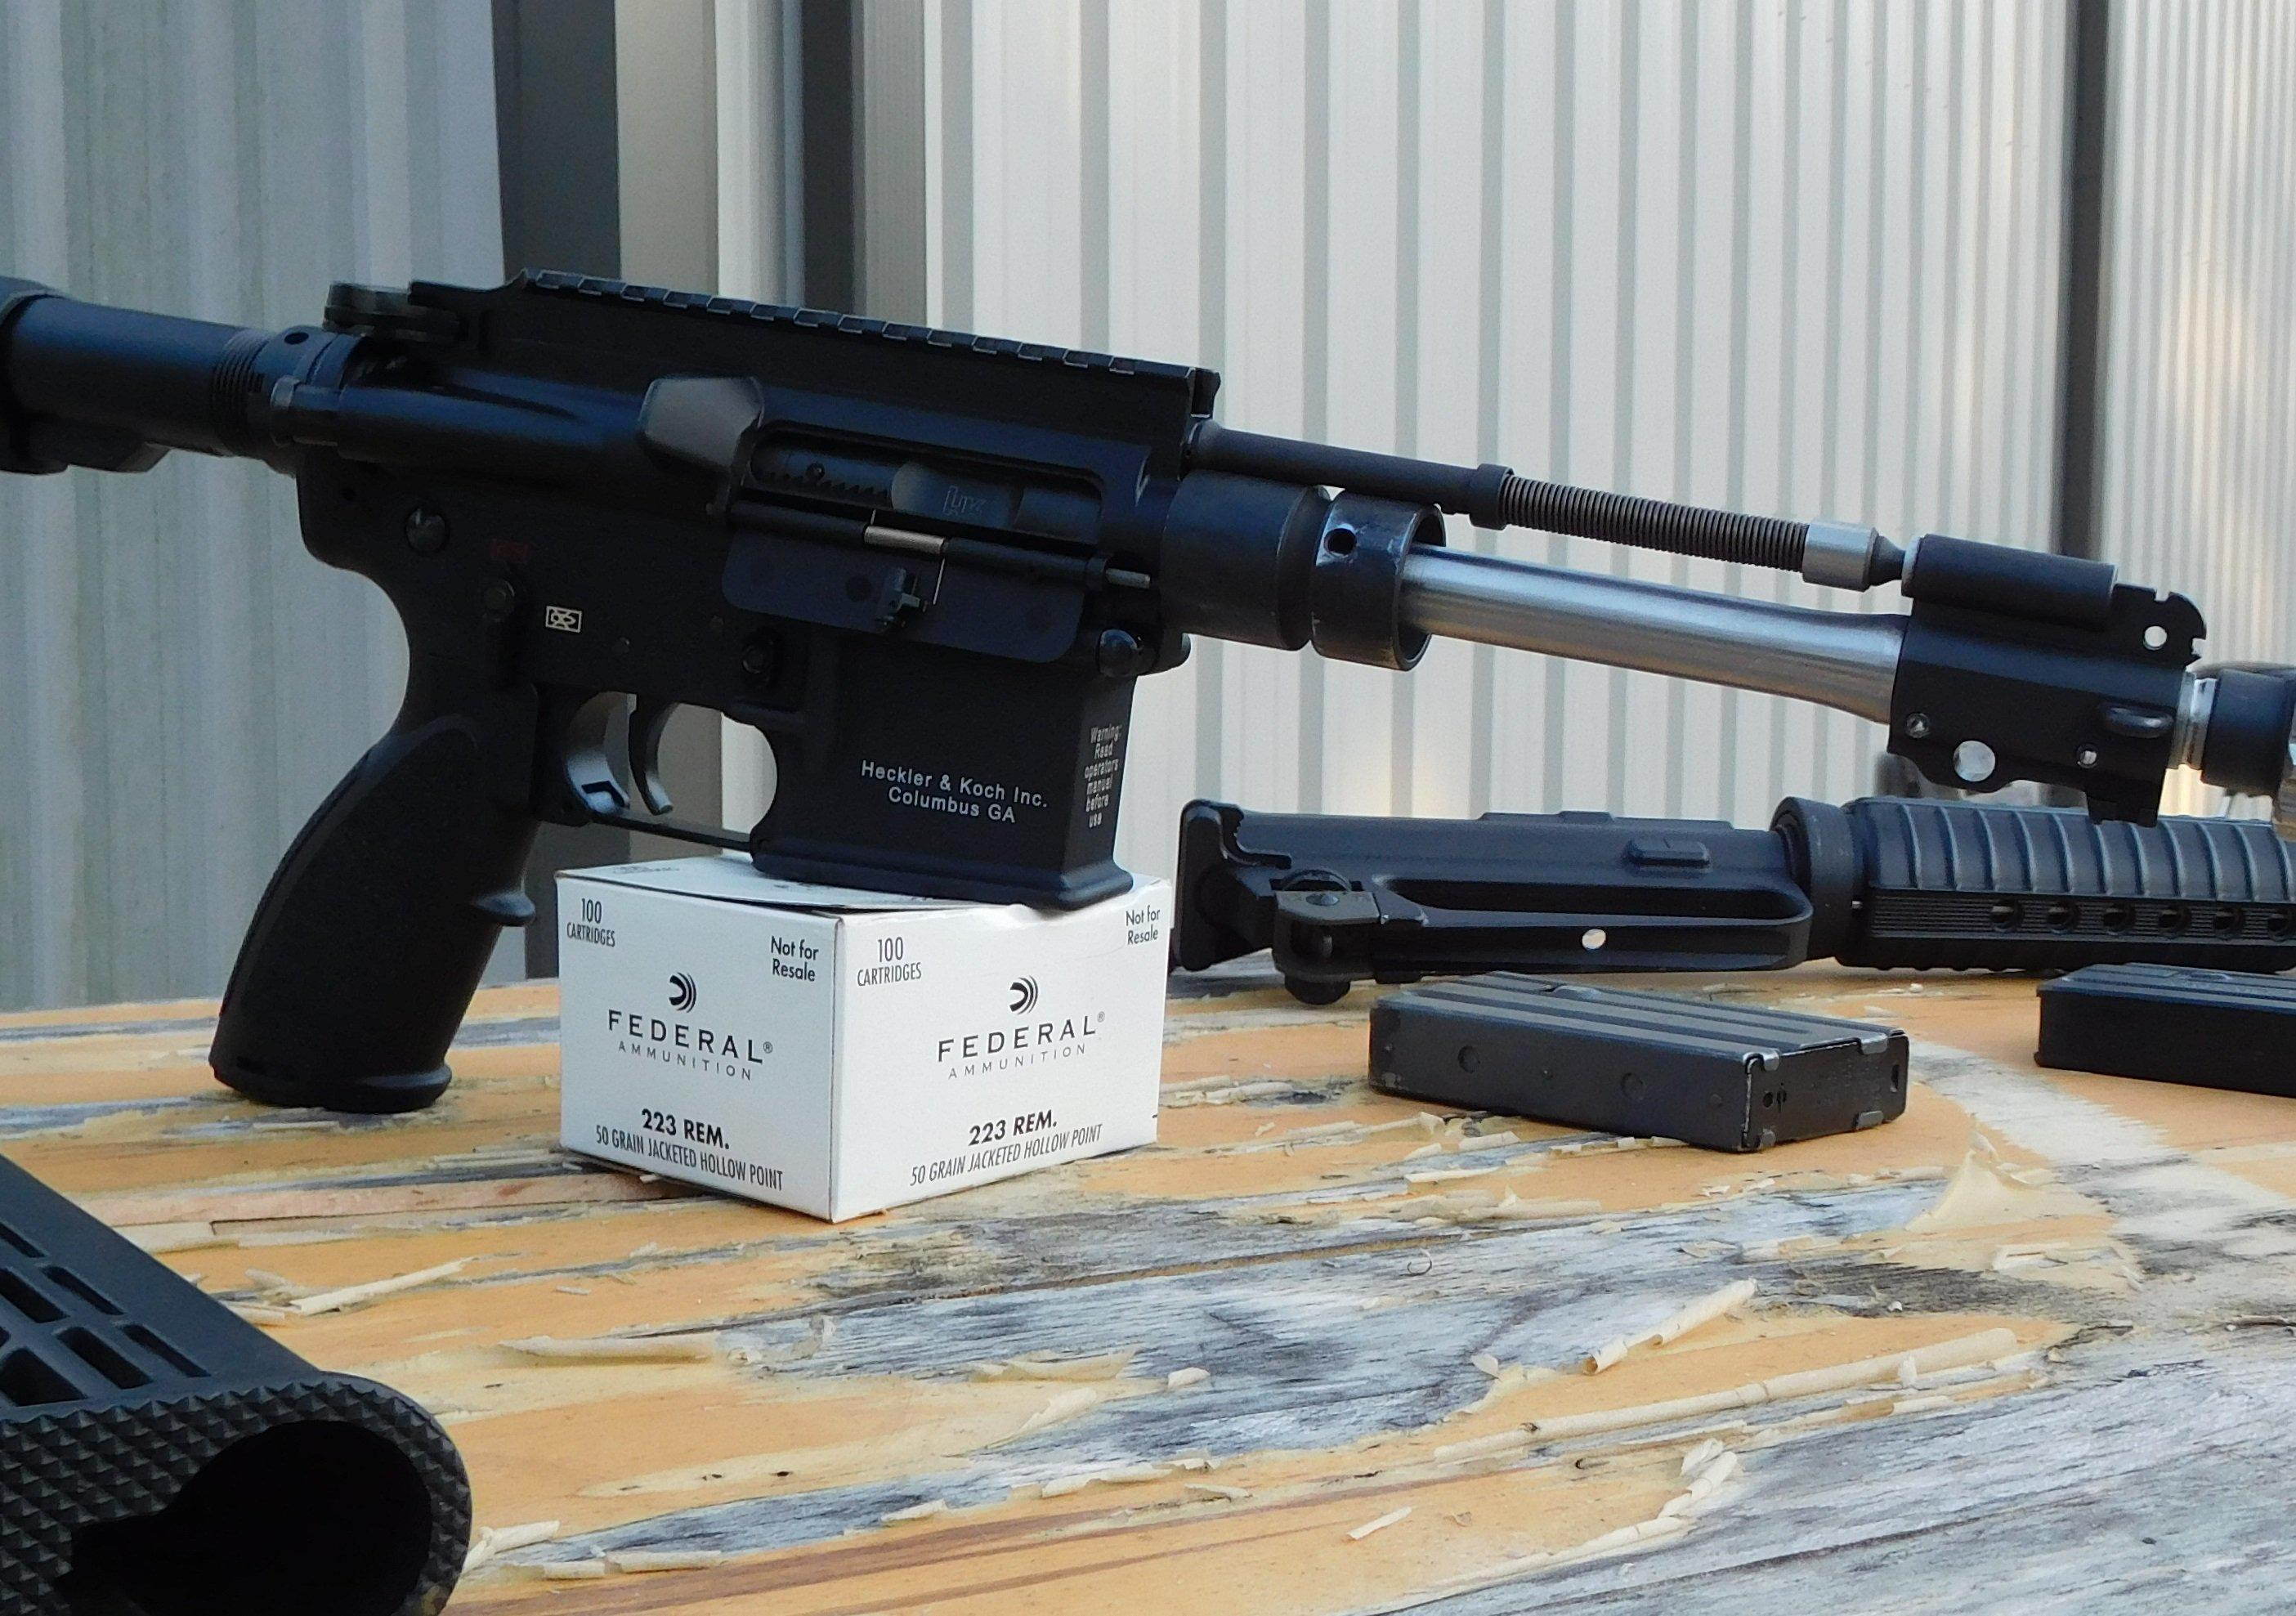 HK416C Gas Problem-9.0-pdw-3.jpg